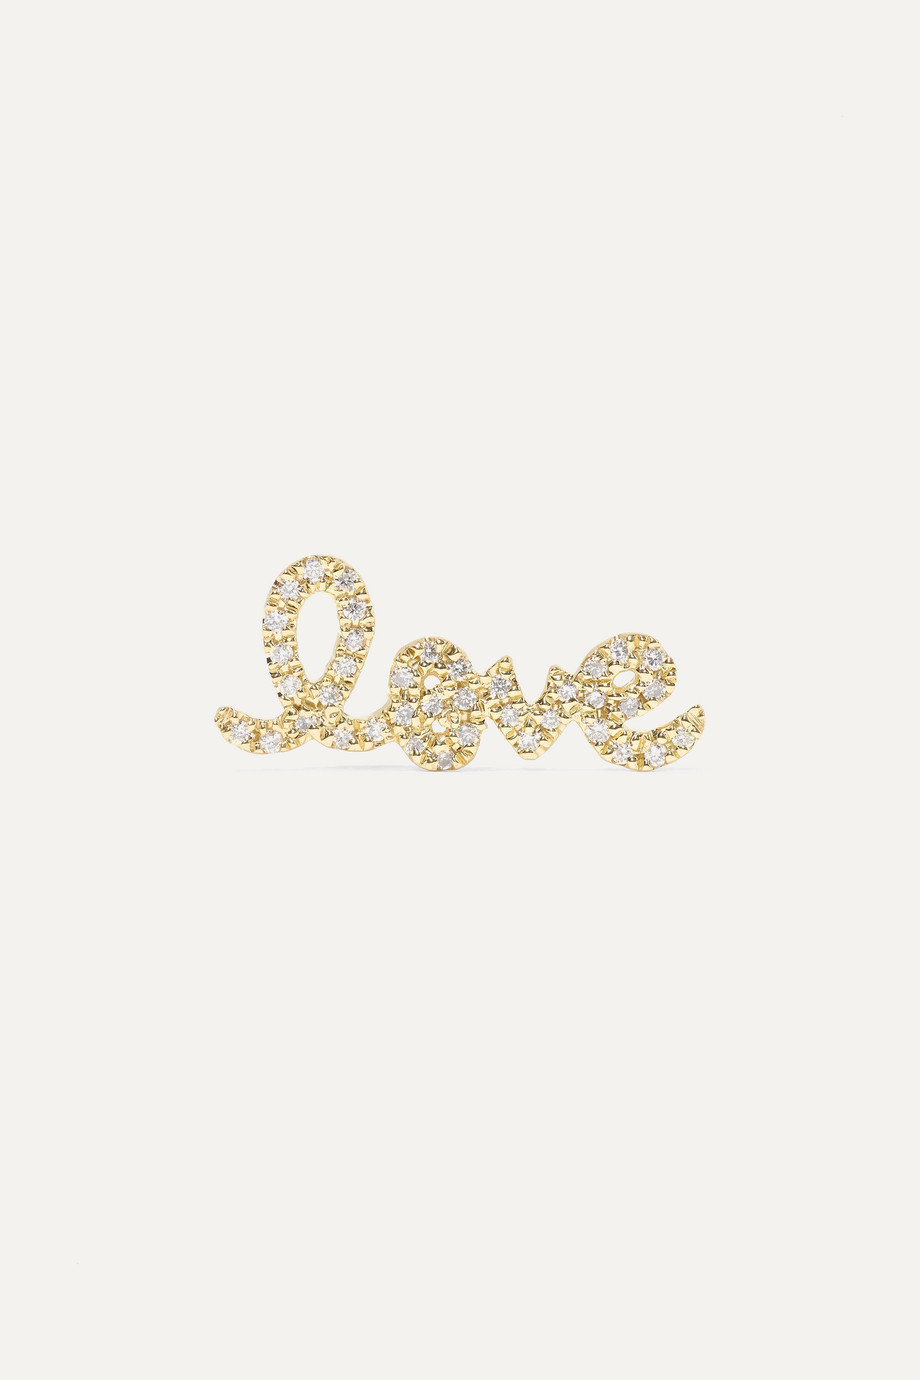 Sydney Evan Love 14-karat gold diamond earring